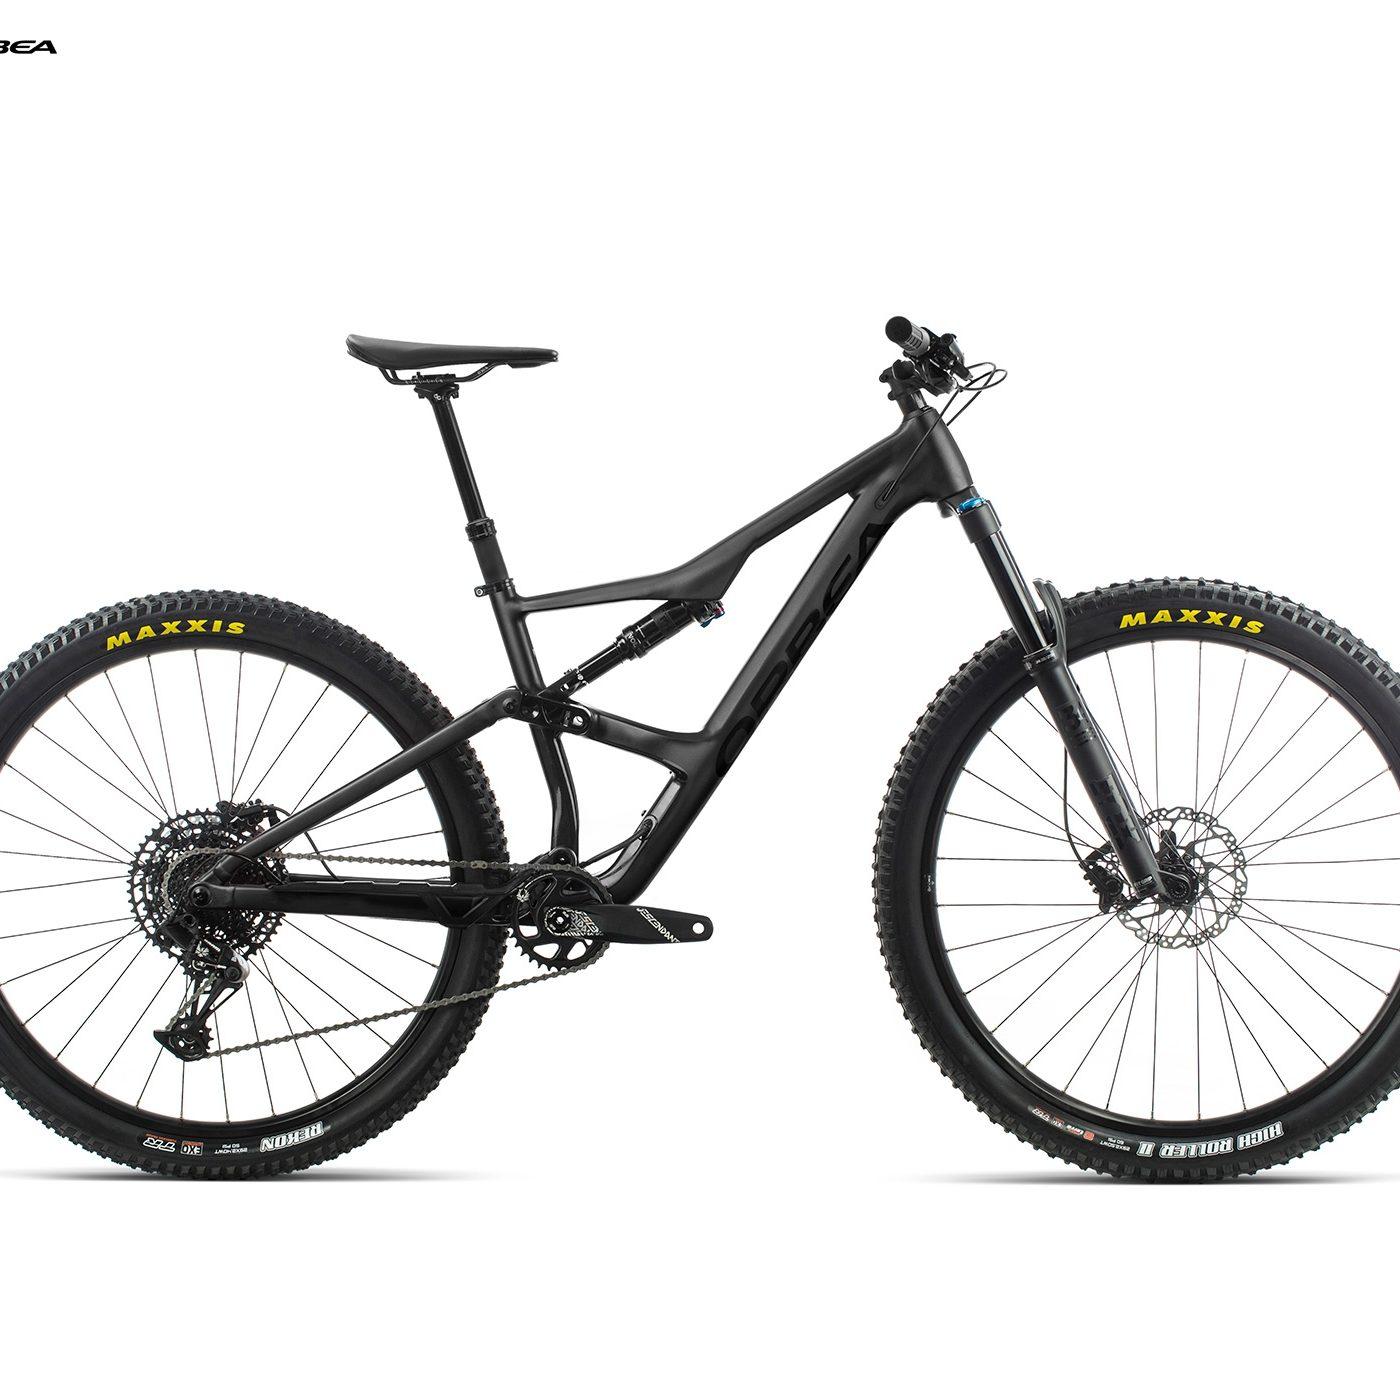 ORBEA Occam H20-EAGLE - METALLIC ZWART (DOF-GLOSS) @G-Bikes